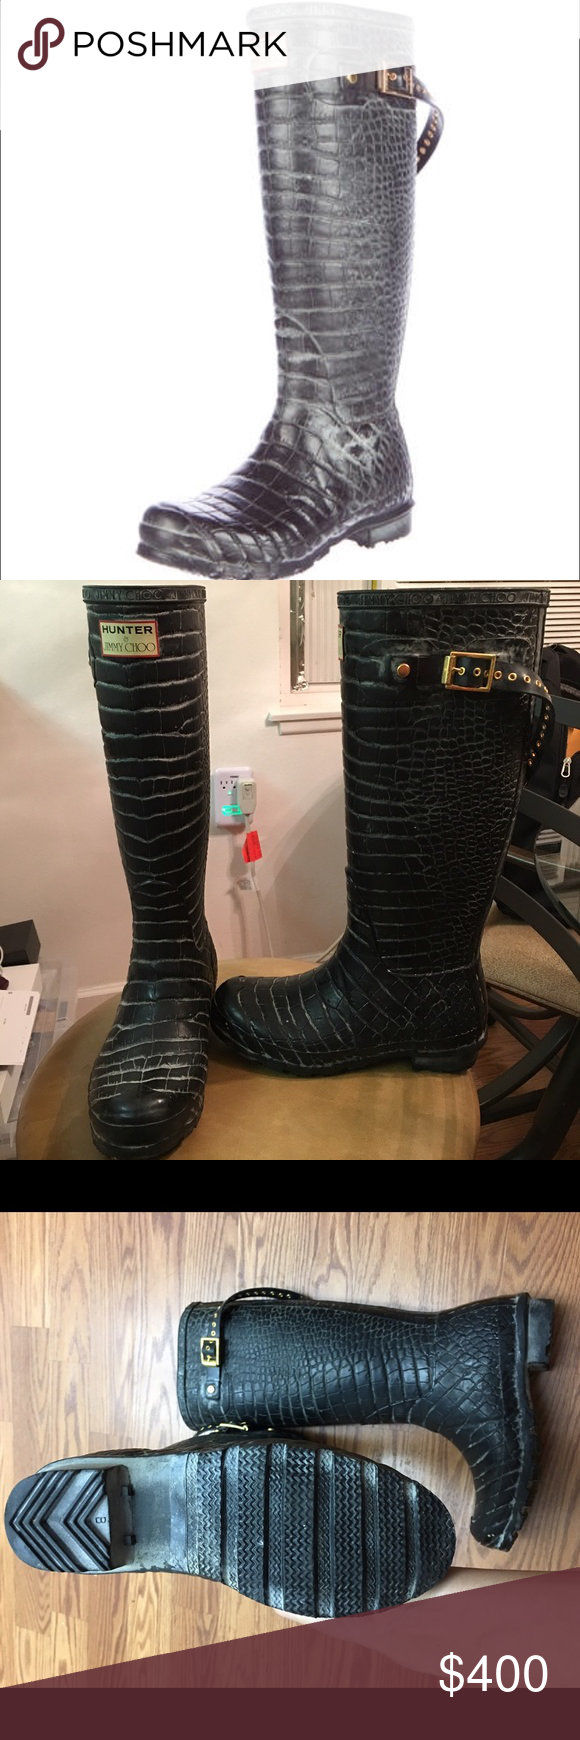 00cfd0e11ae7 Jimmy Choo x Hunter Embossed Rainboots 6-7 So cute Distressed black  embossed alligator print